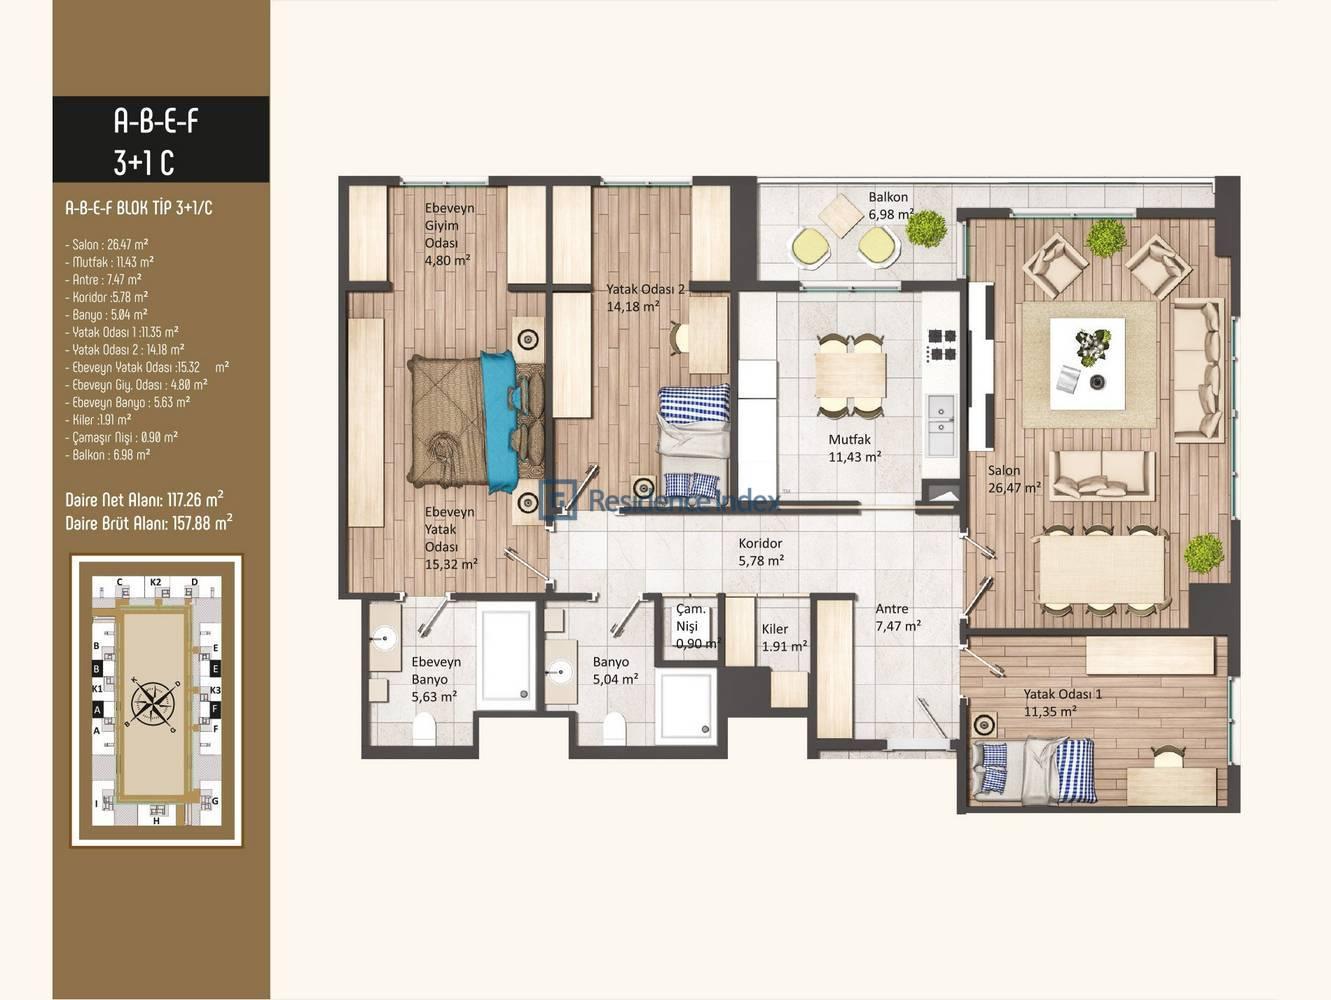 Kameroğlu Metrohome Residence 3+1 C